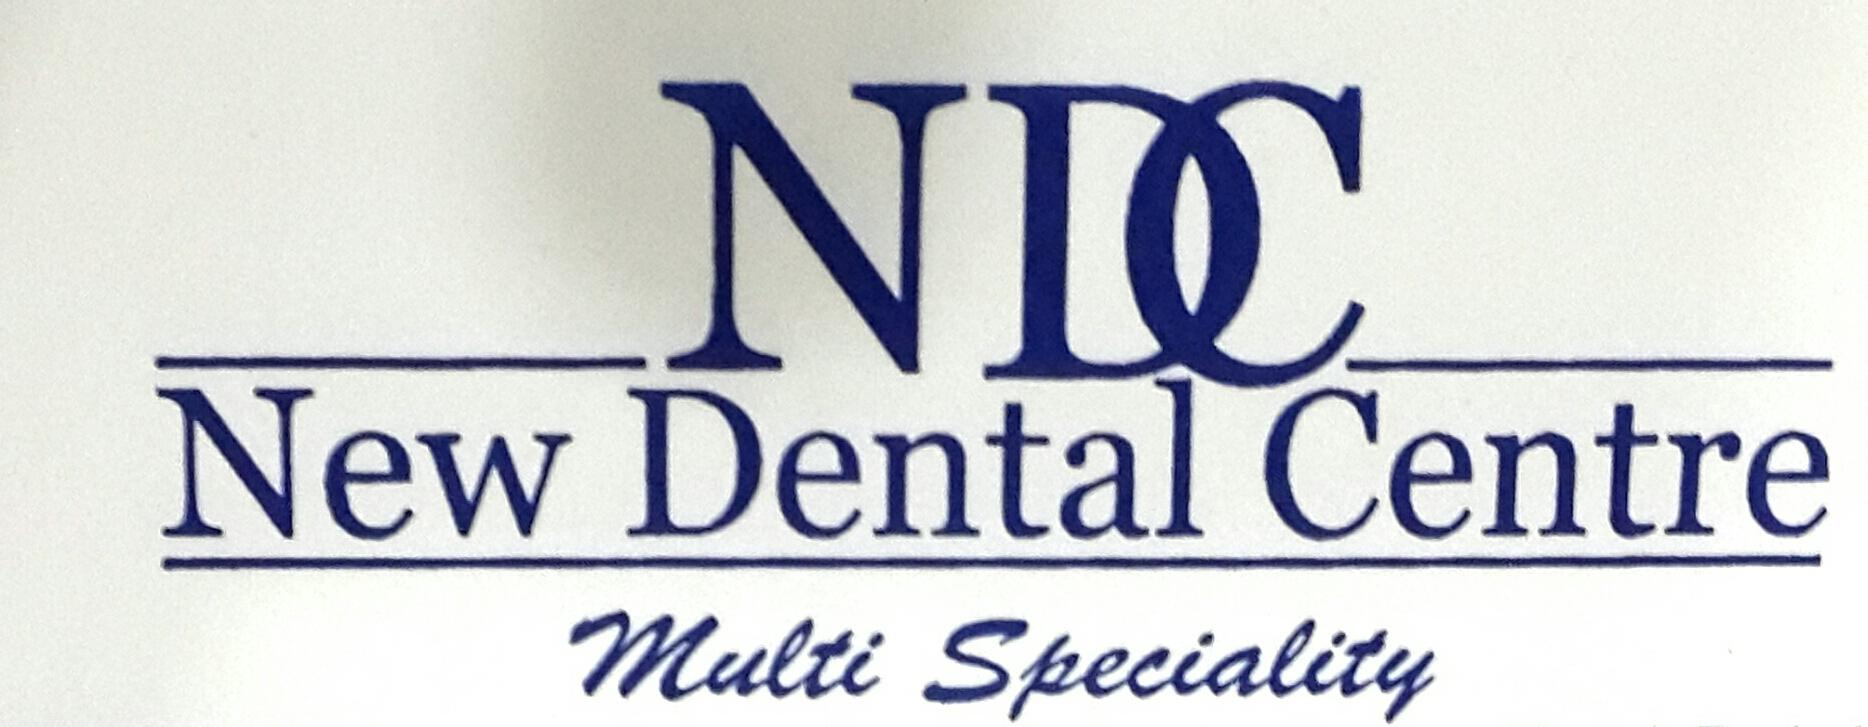 New Dental Centre